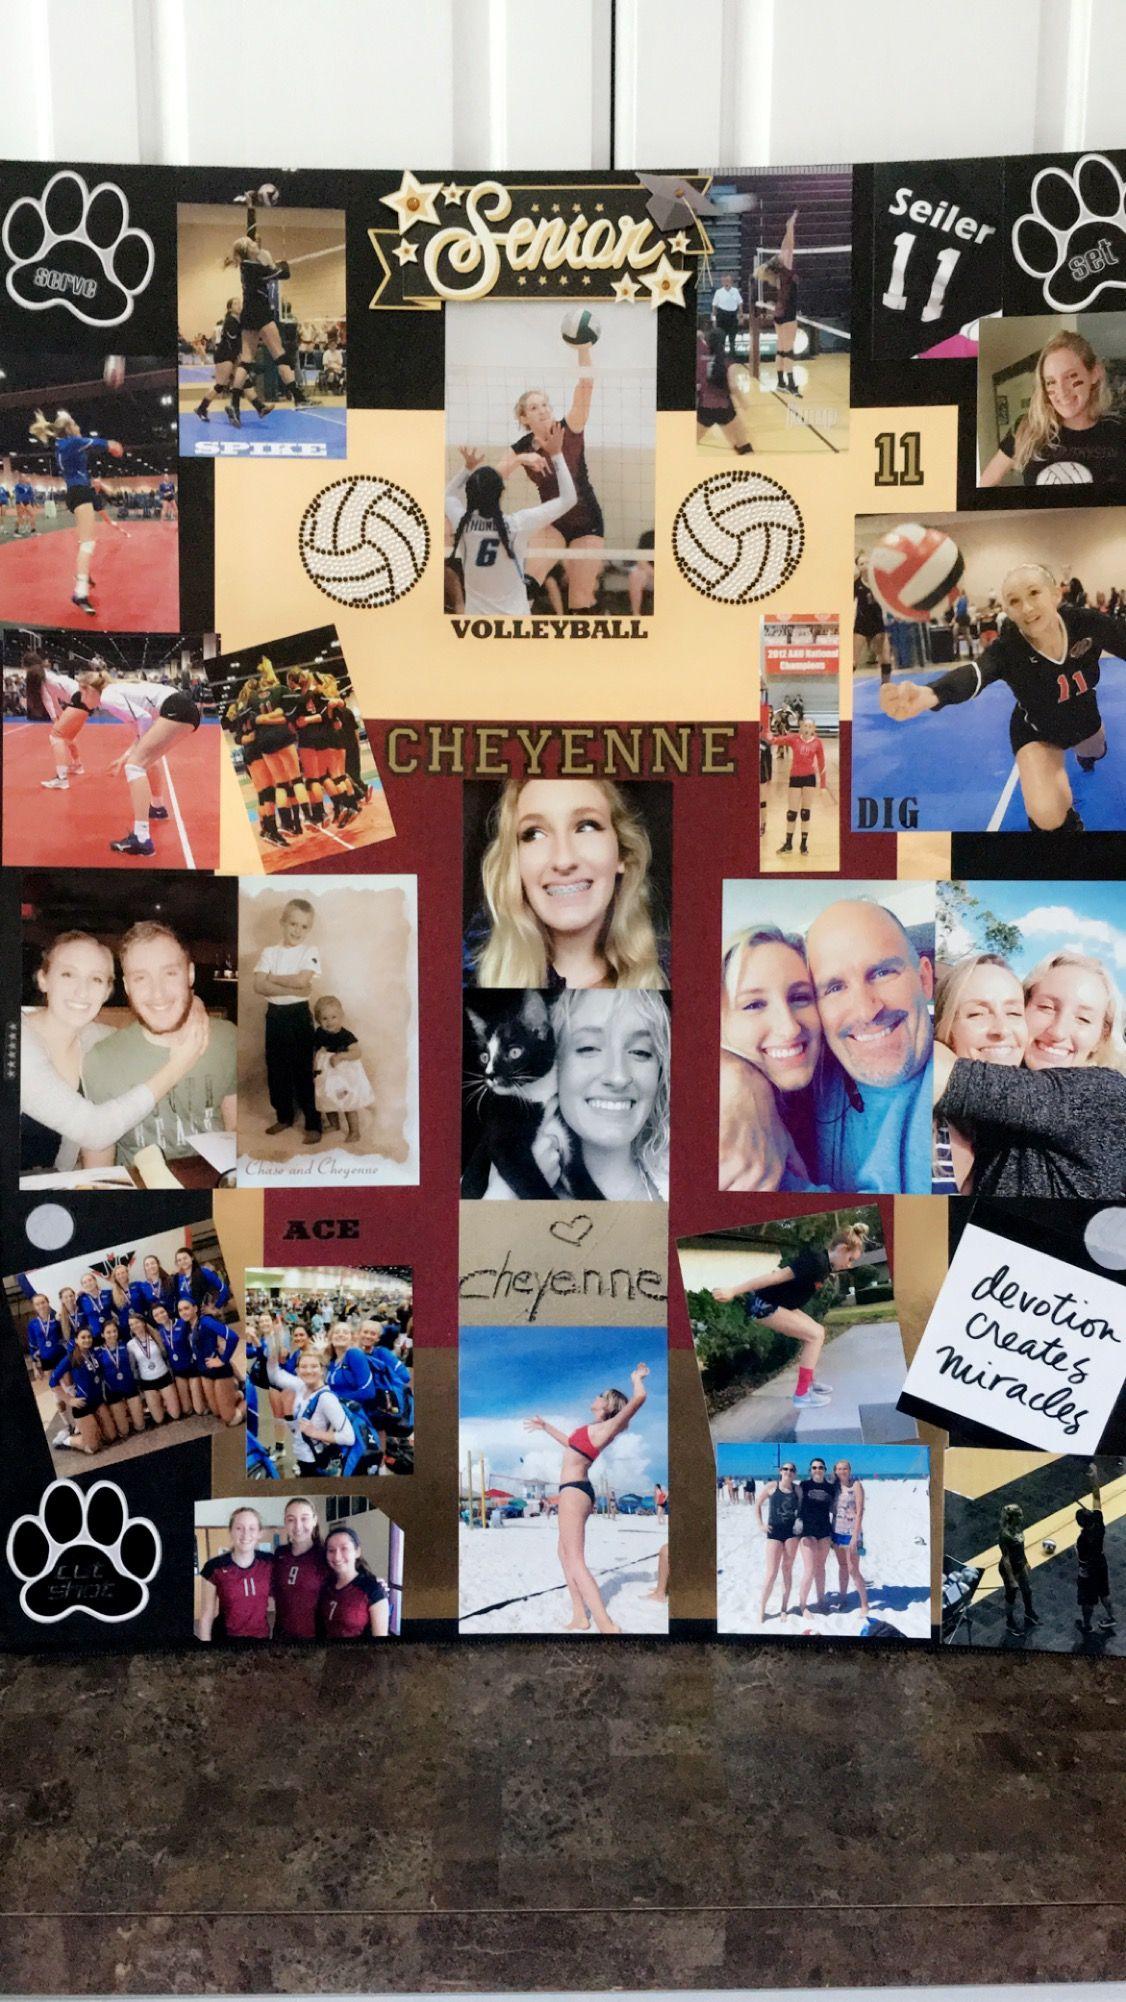 Senior Graduation Memory Board Volleyball Memory Board Photo Display Volleyball S Graduation Memory Board Graduation Memories Graduation Picture Display